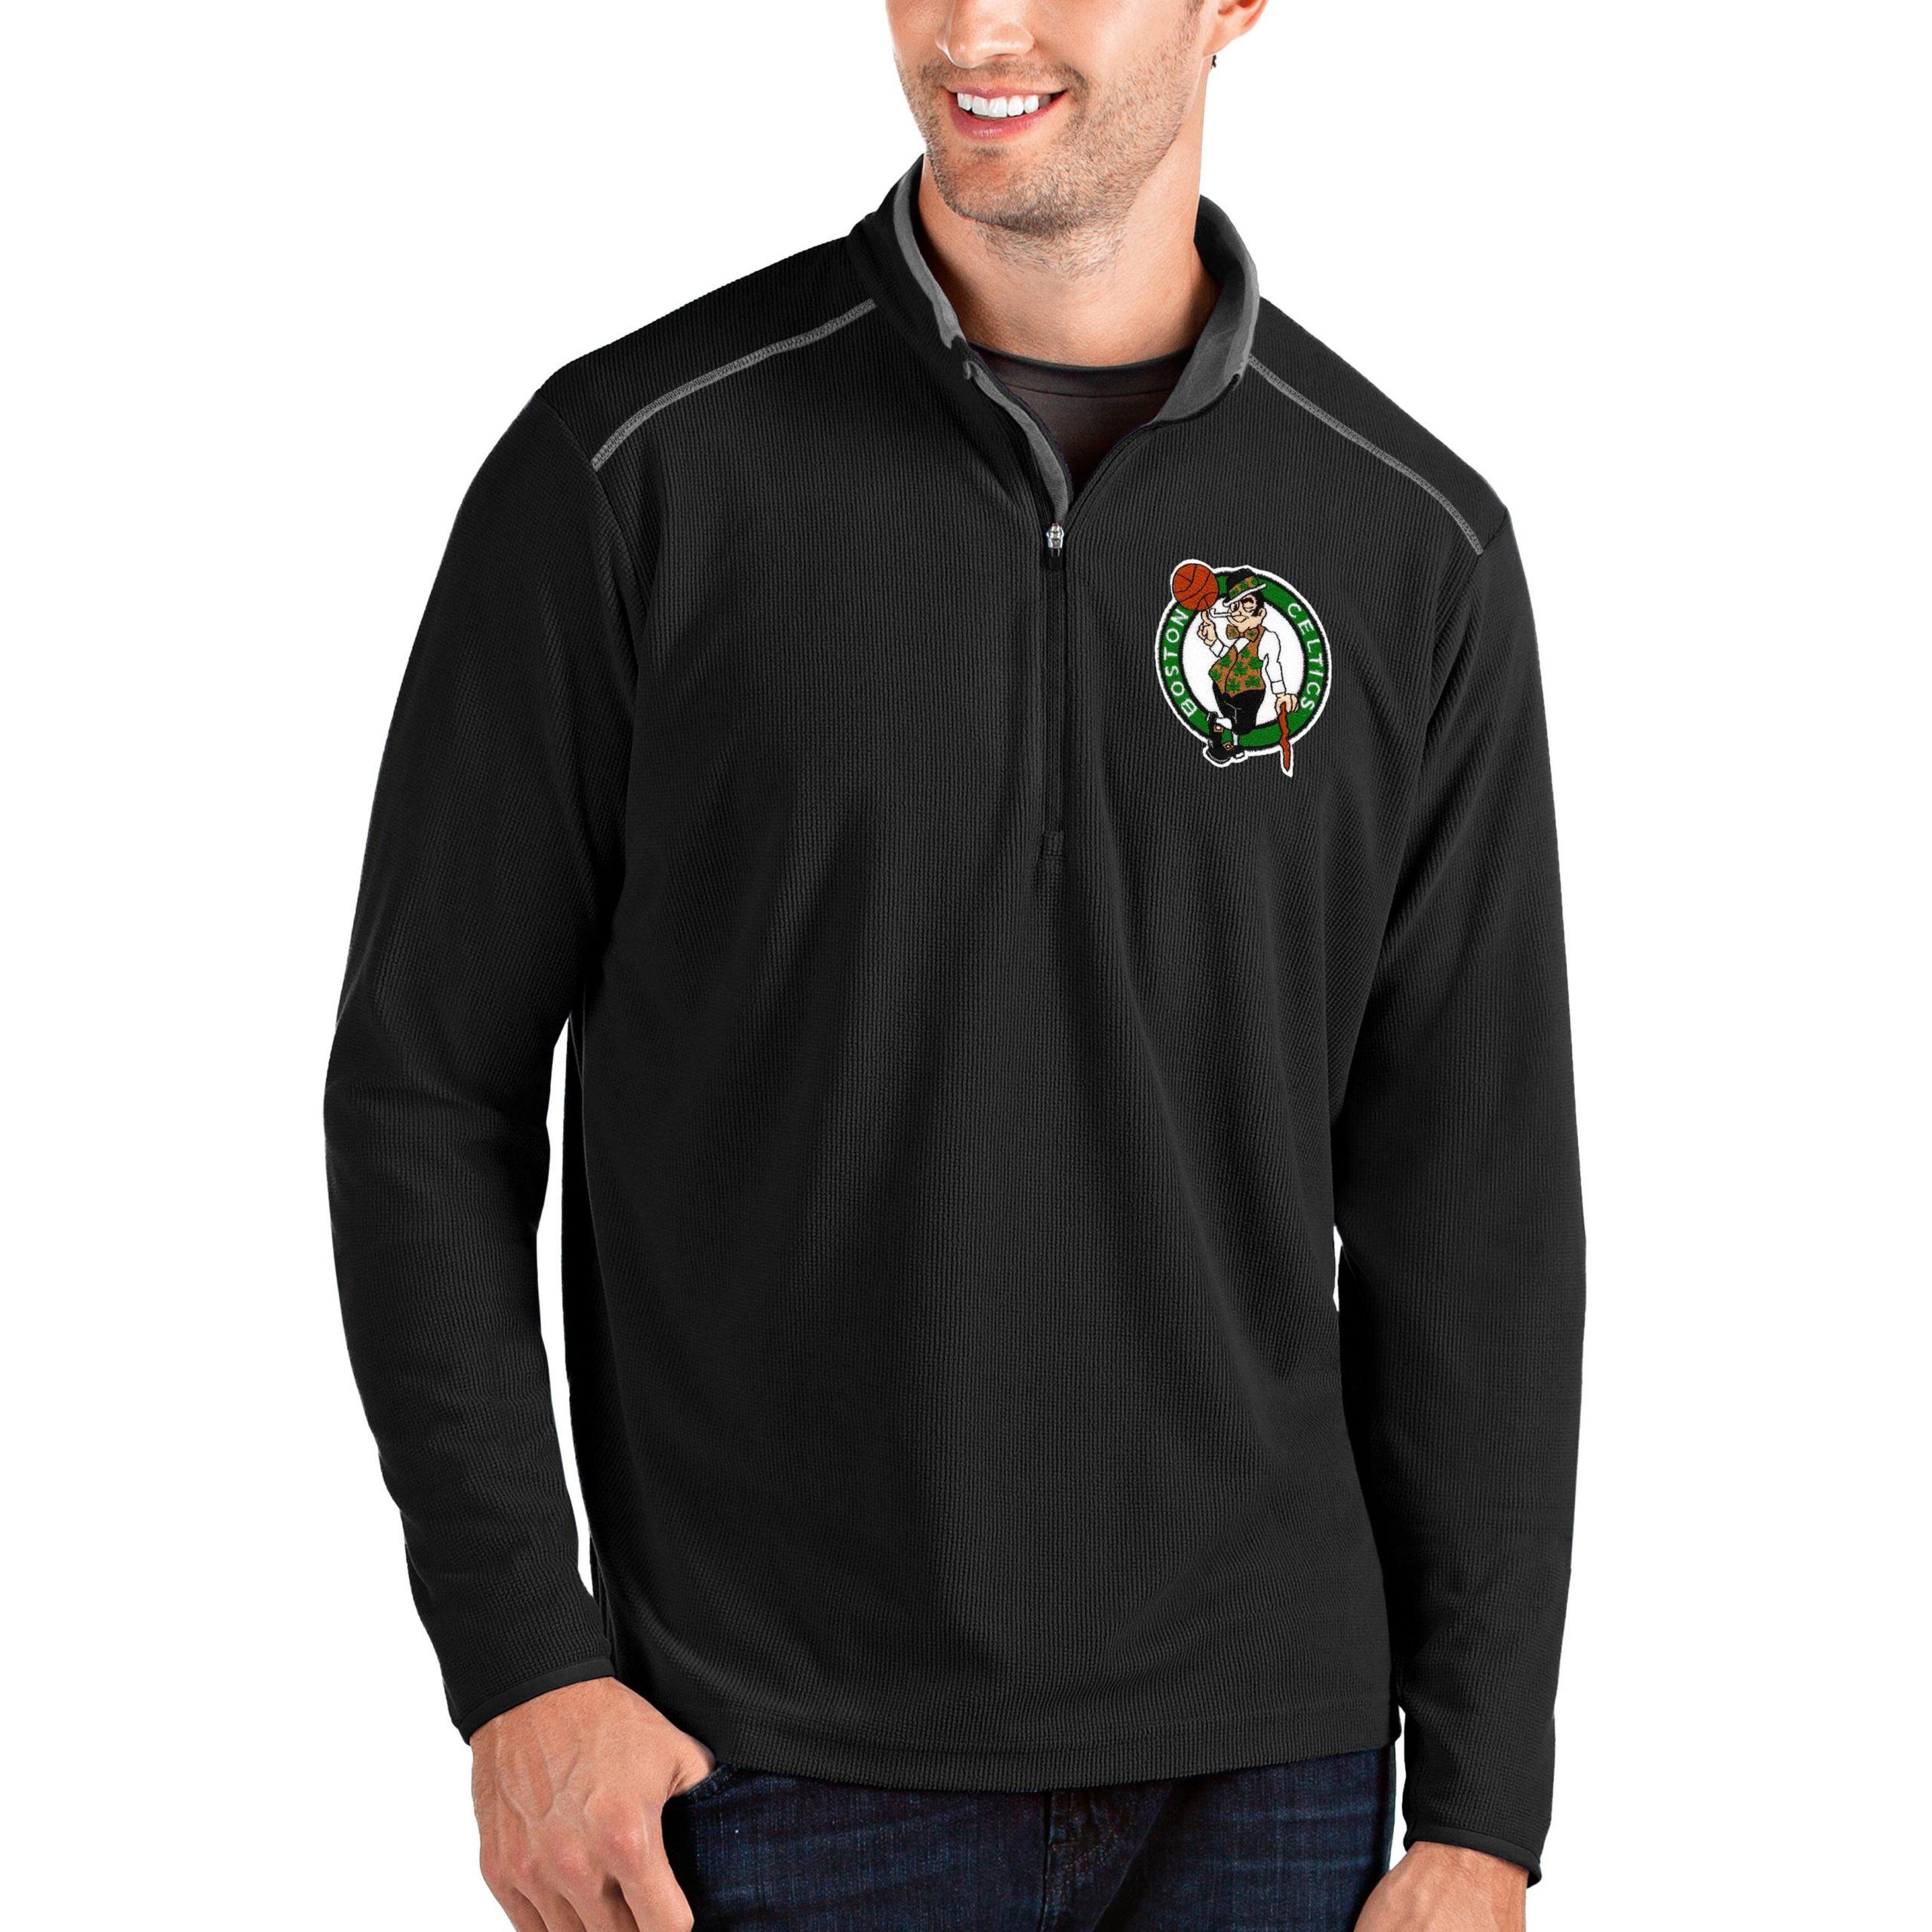 Boston Celtics Antigua Big & Tall Glacier Quarter-Zip Pullover Jacket - Black/Gray